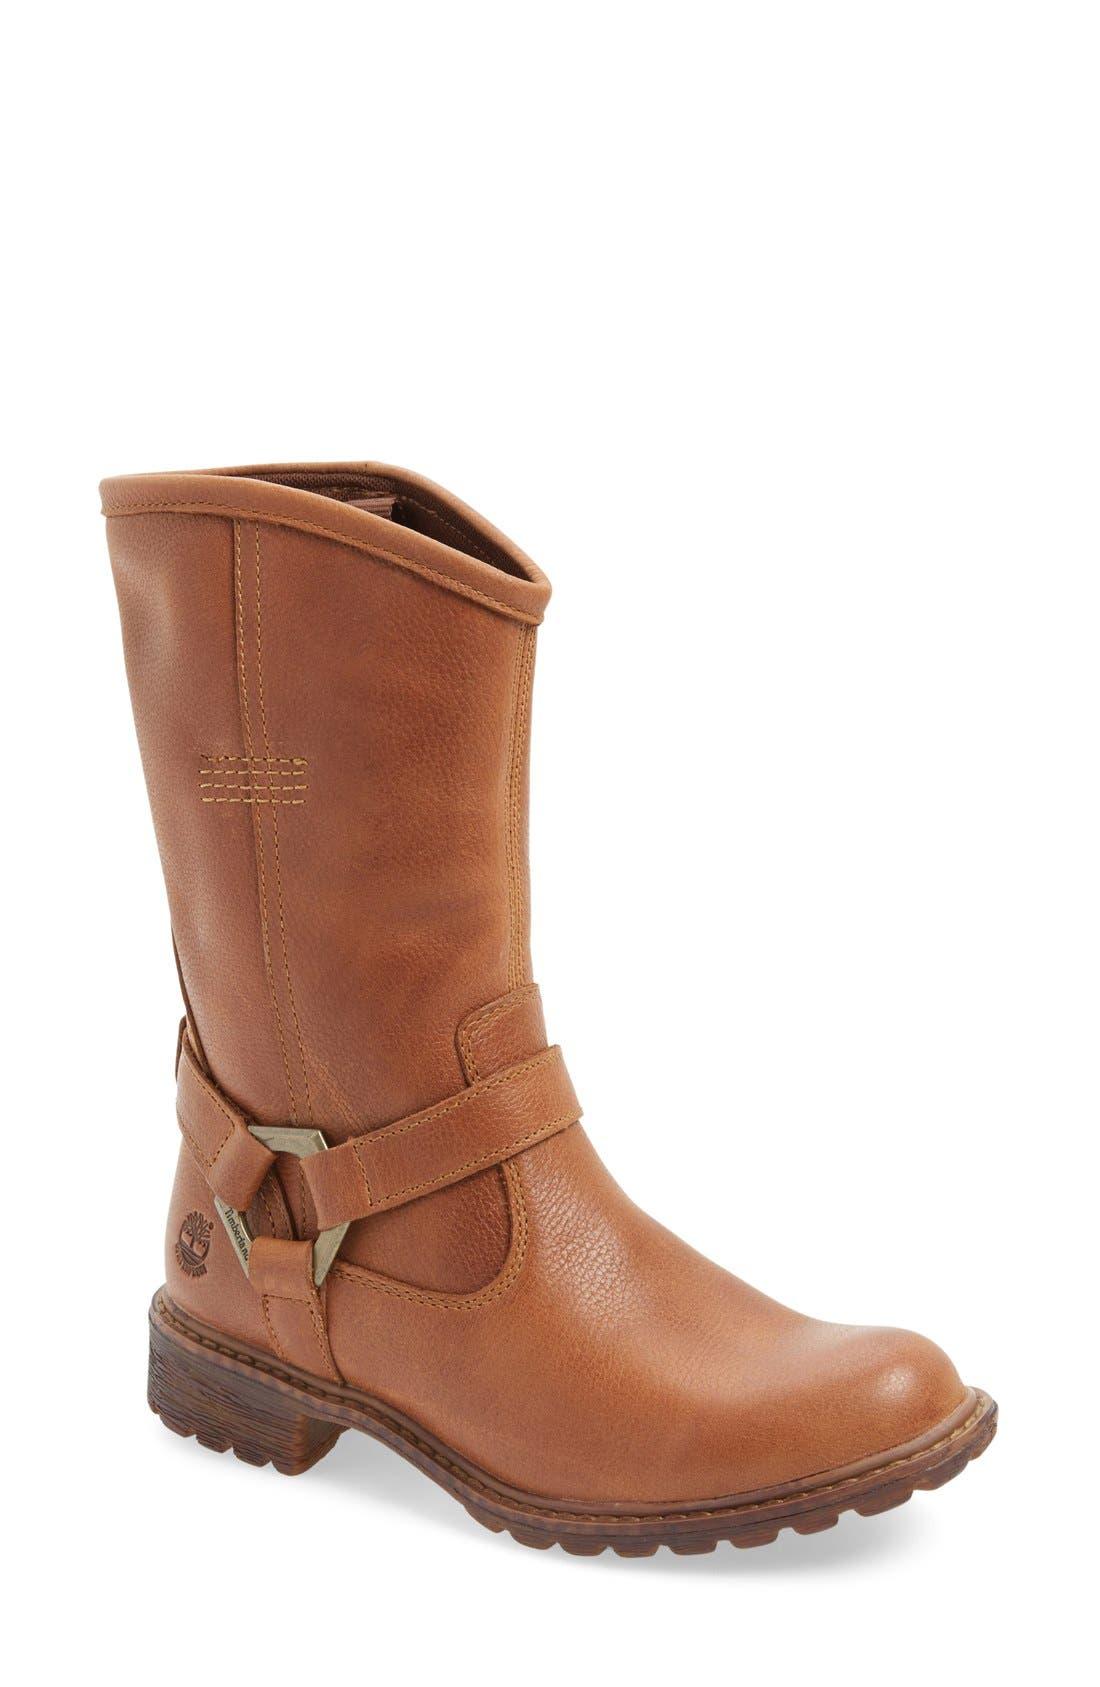 Alternate Image 1 Selected - Timberland Earthkeepers® 'Stoddard' Mid Waterproof Boot (Women)